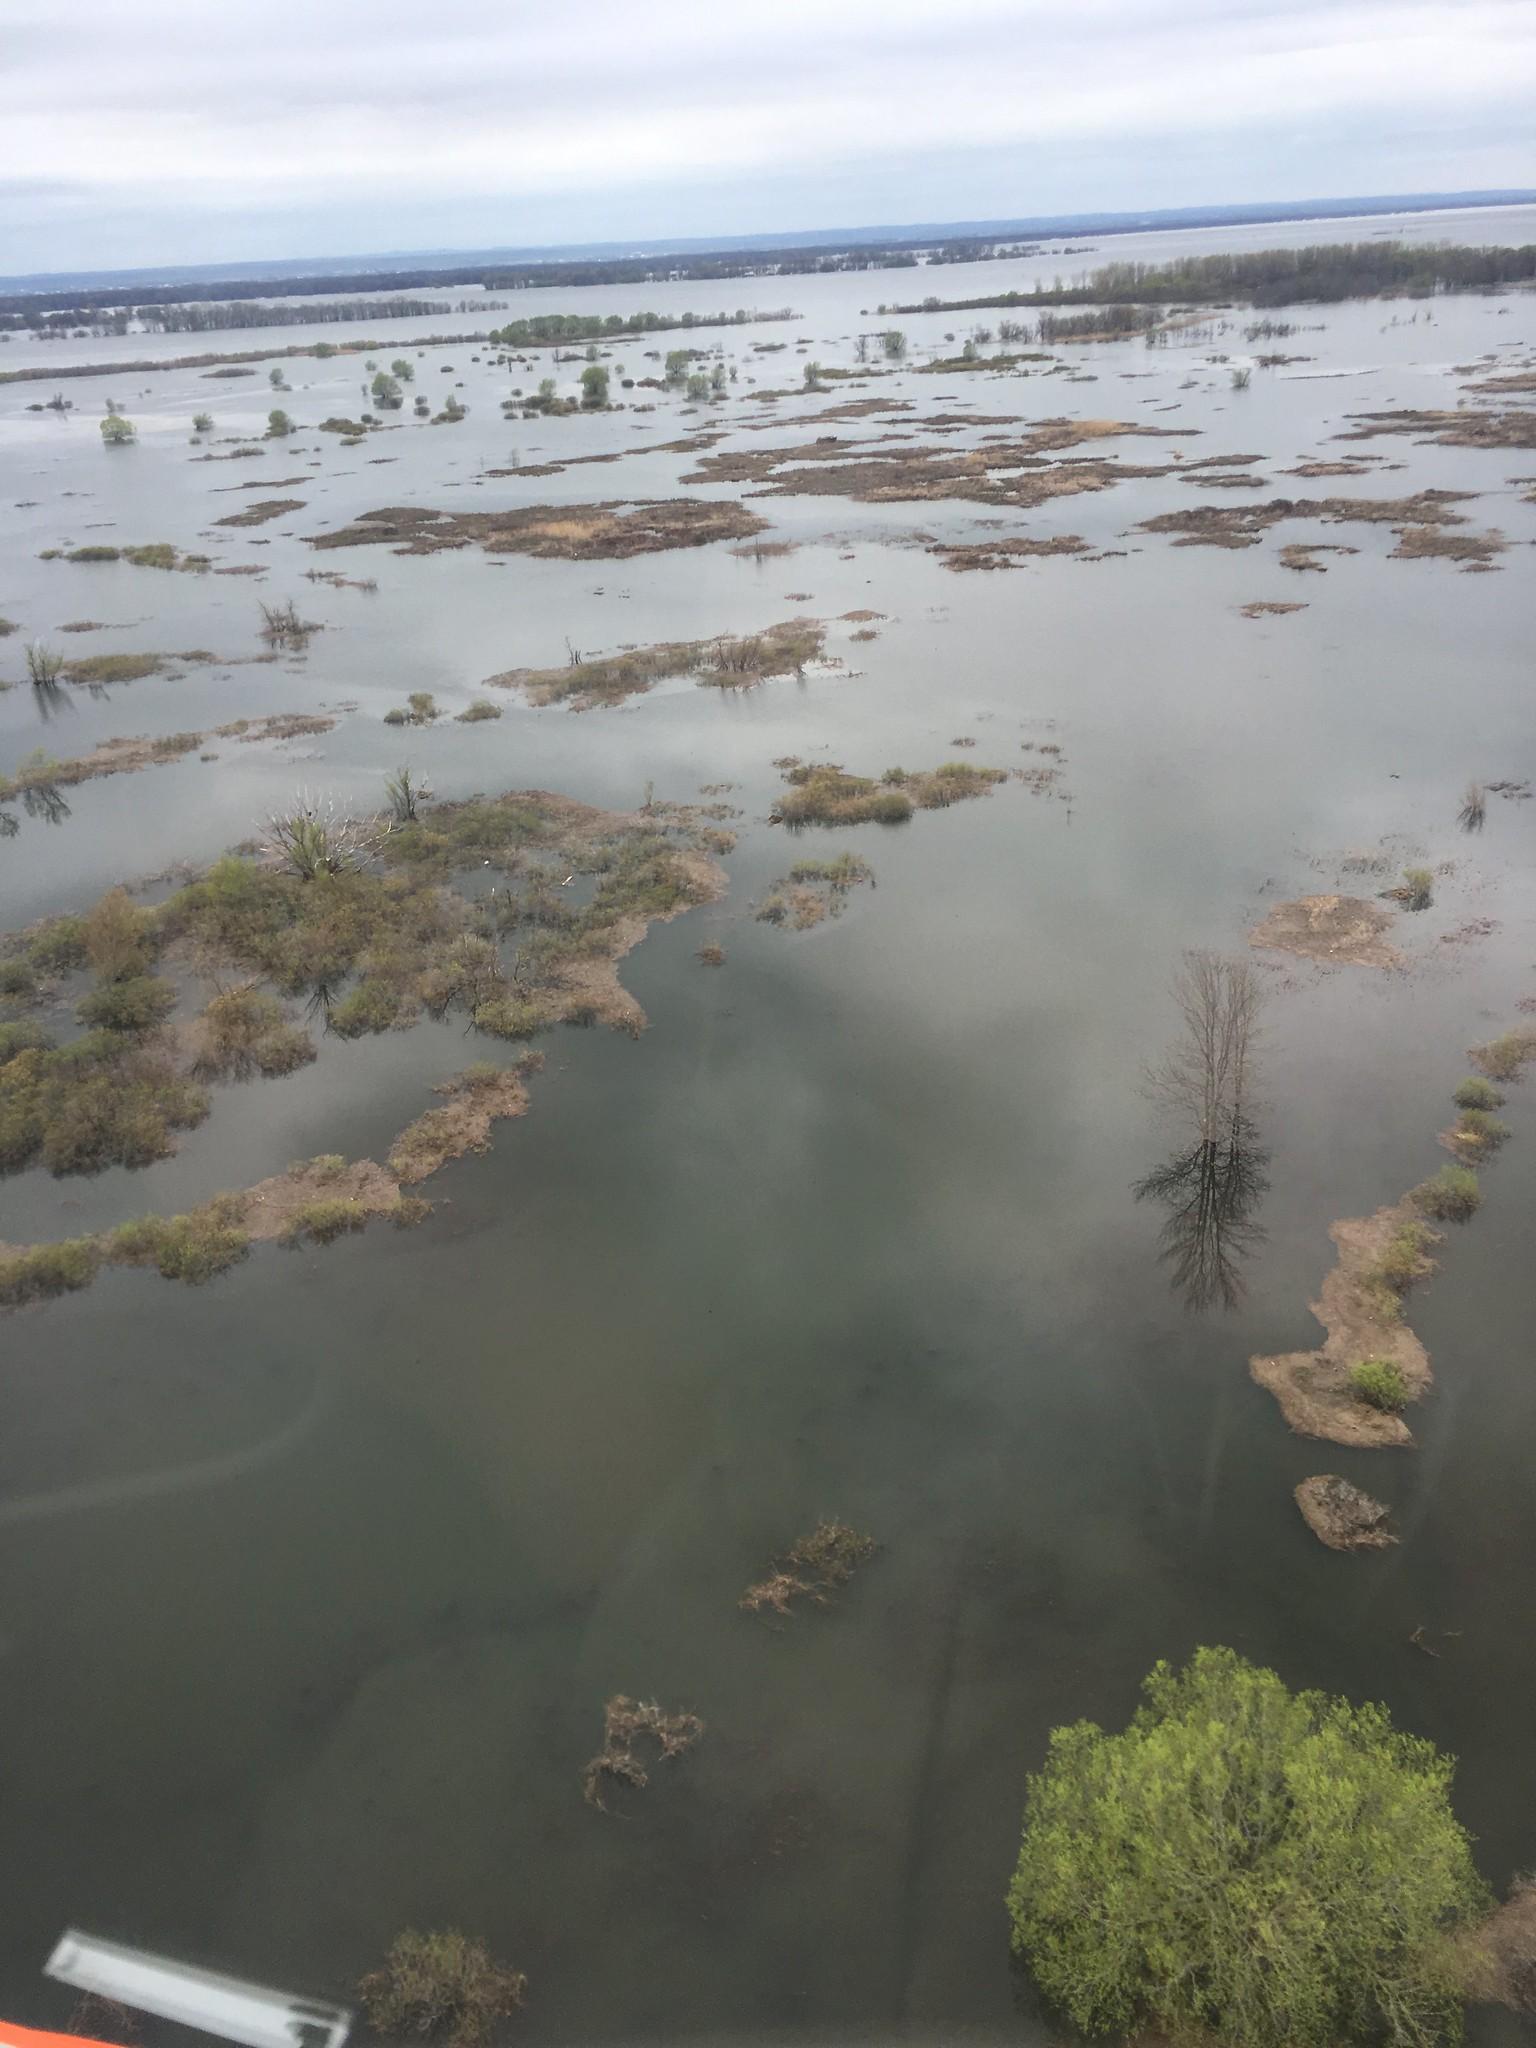 Flooding rivers were abundant along transects in 2019. Photo: Garrett Wilkerson, USFWS